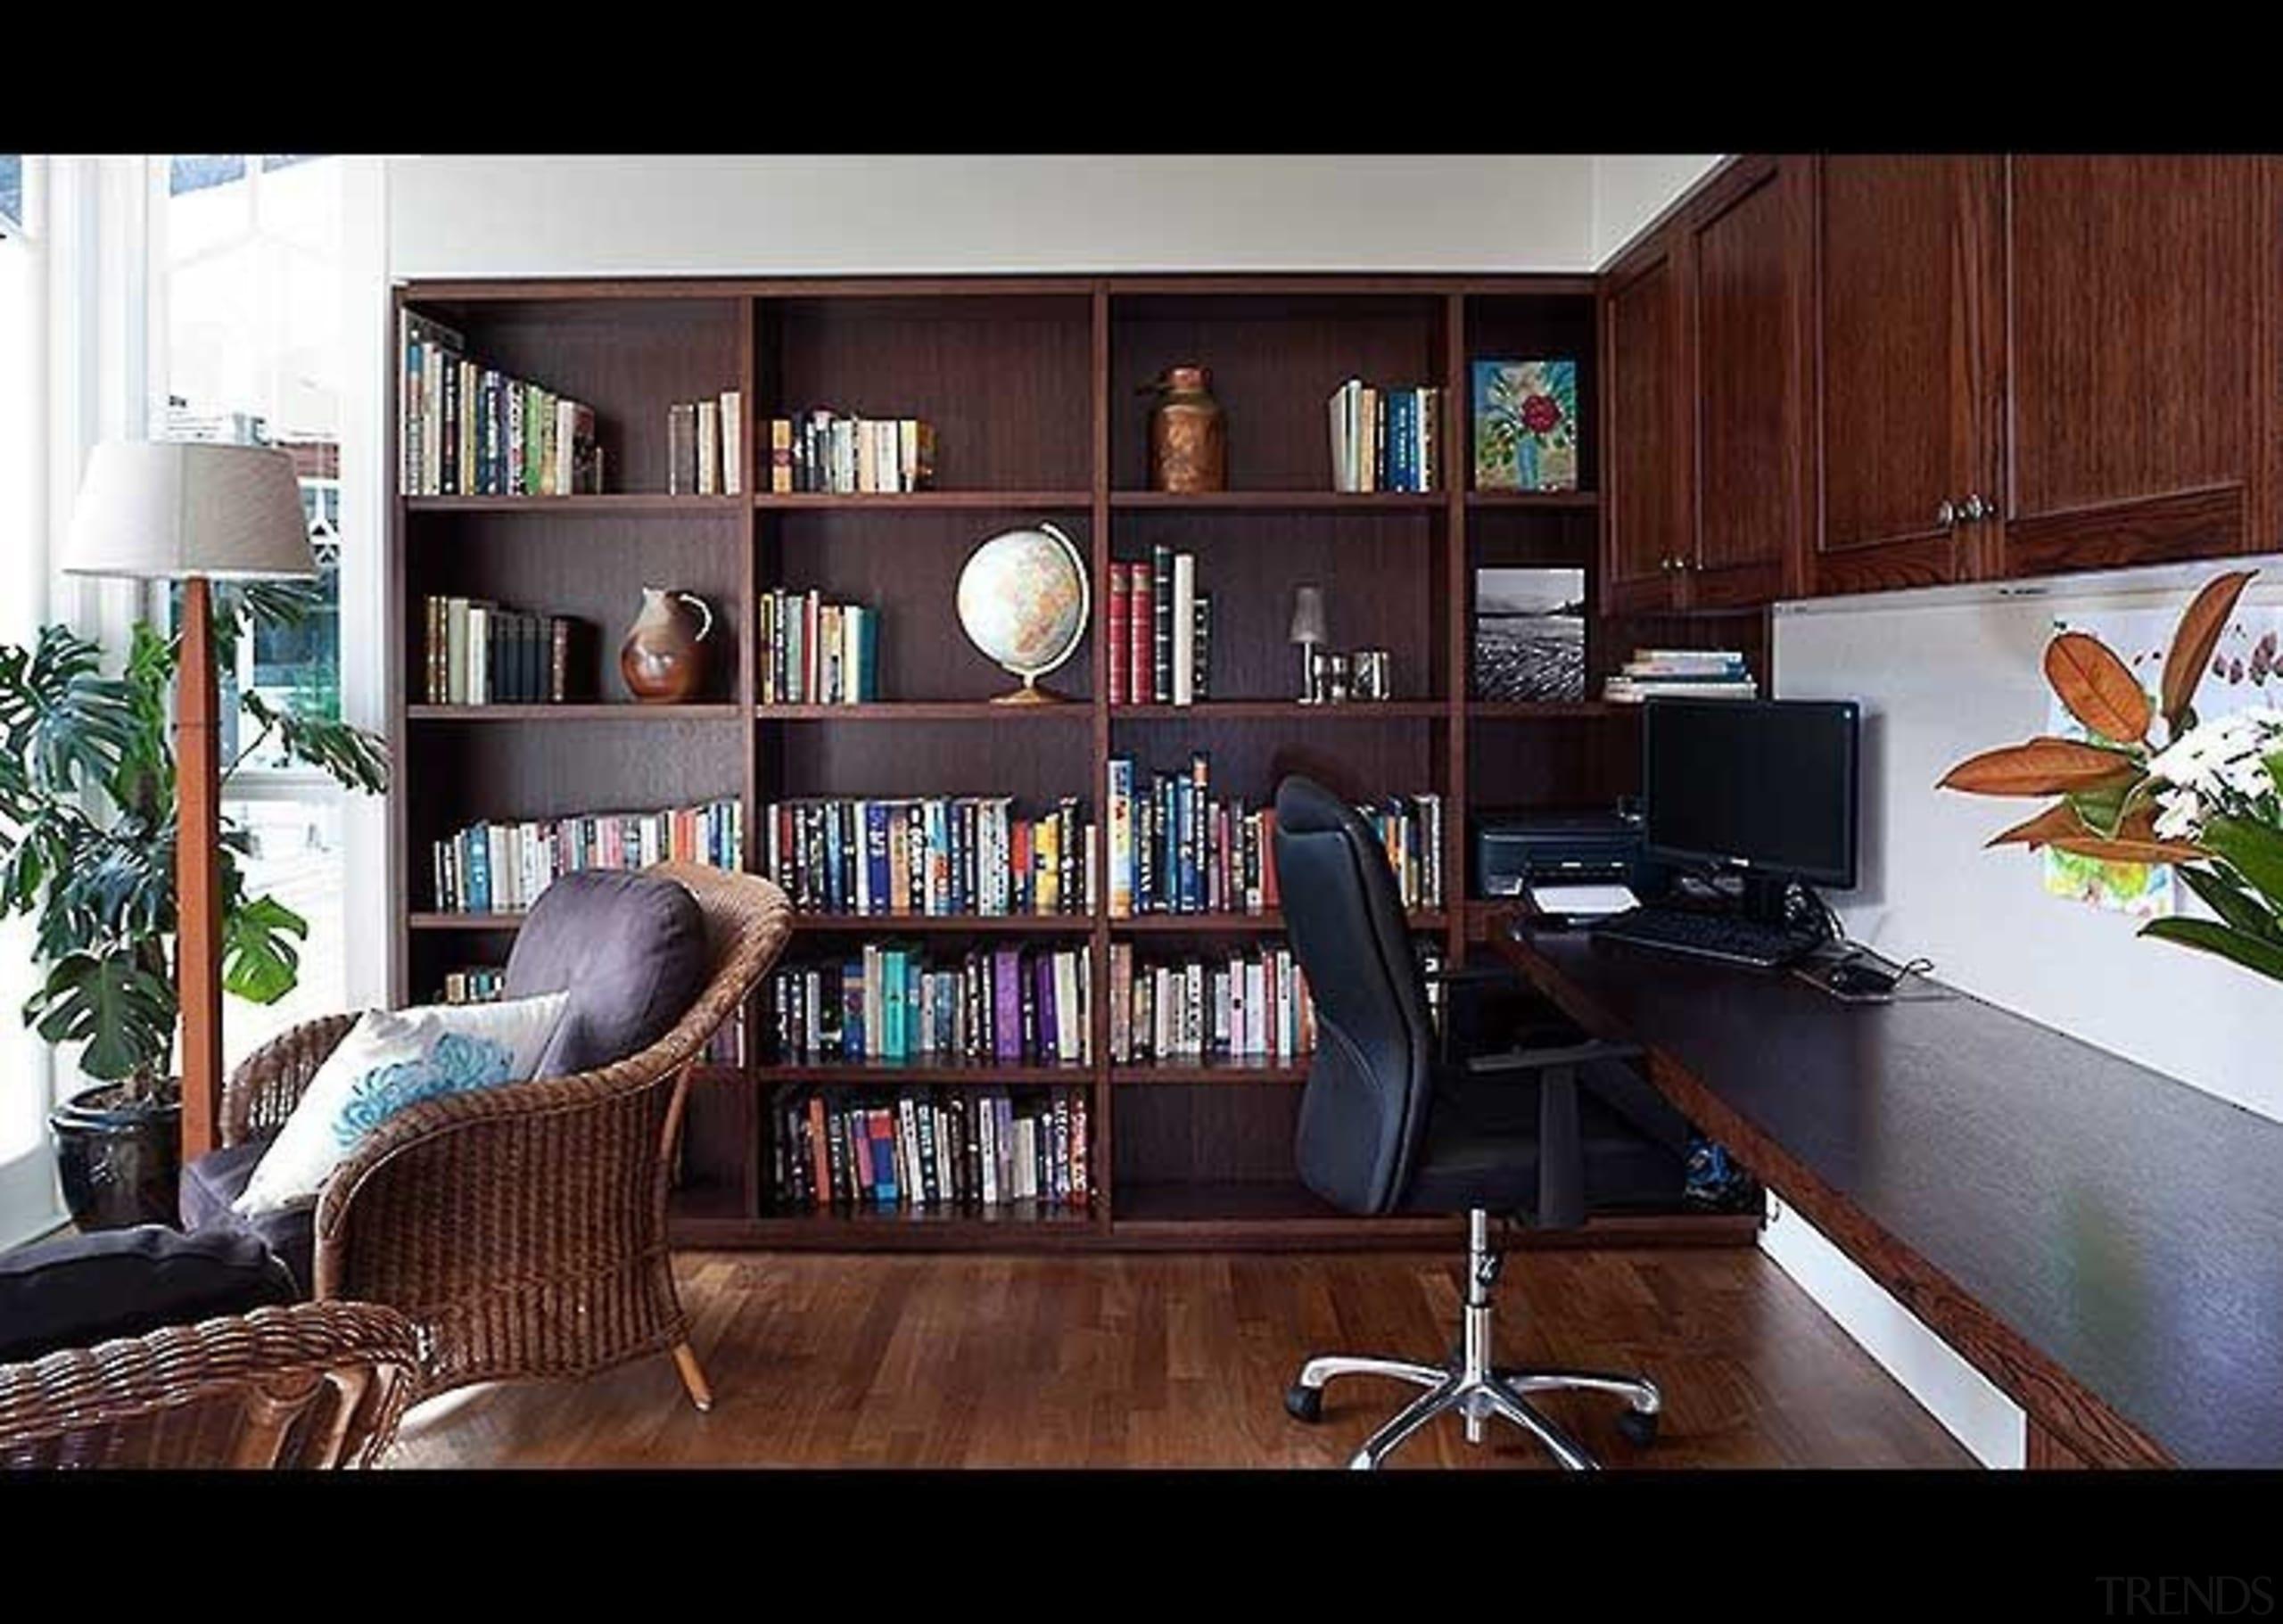 New Wing Study - bookcase | furniture | bookcase, furniture, home, interior design, living room, shelf, shelving, red, black